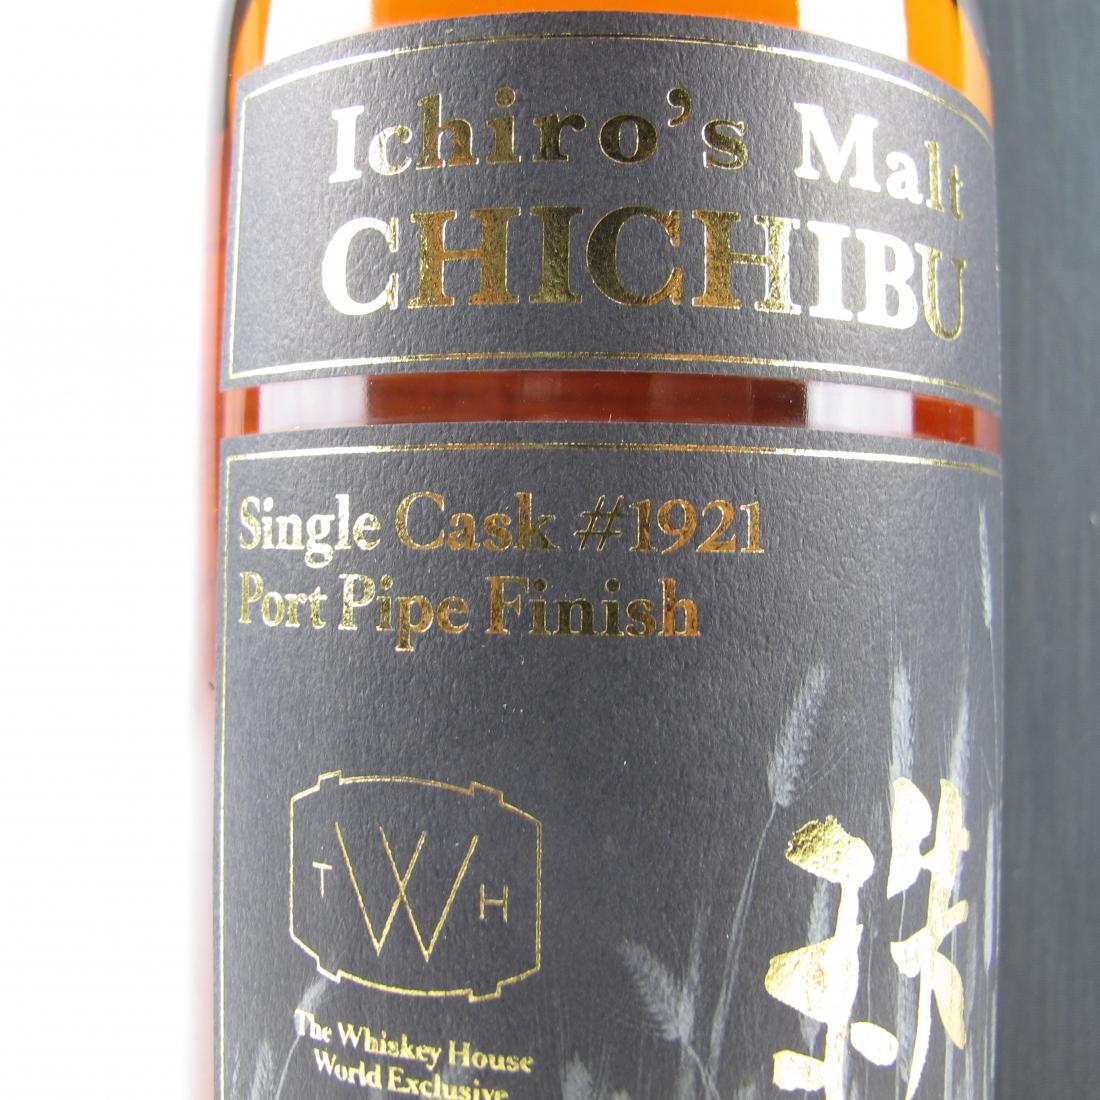 Chichibu 2009 Ichiro's Malt Port Pipe Single Cask #1921